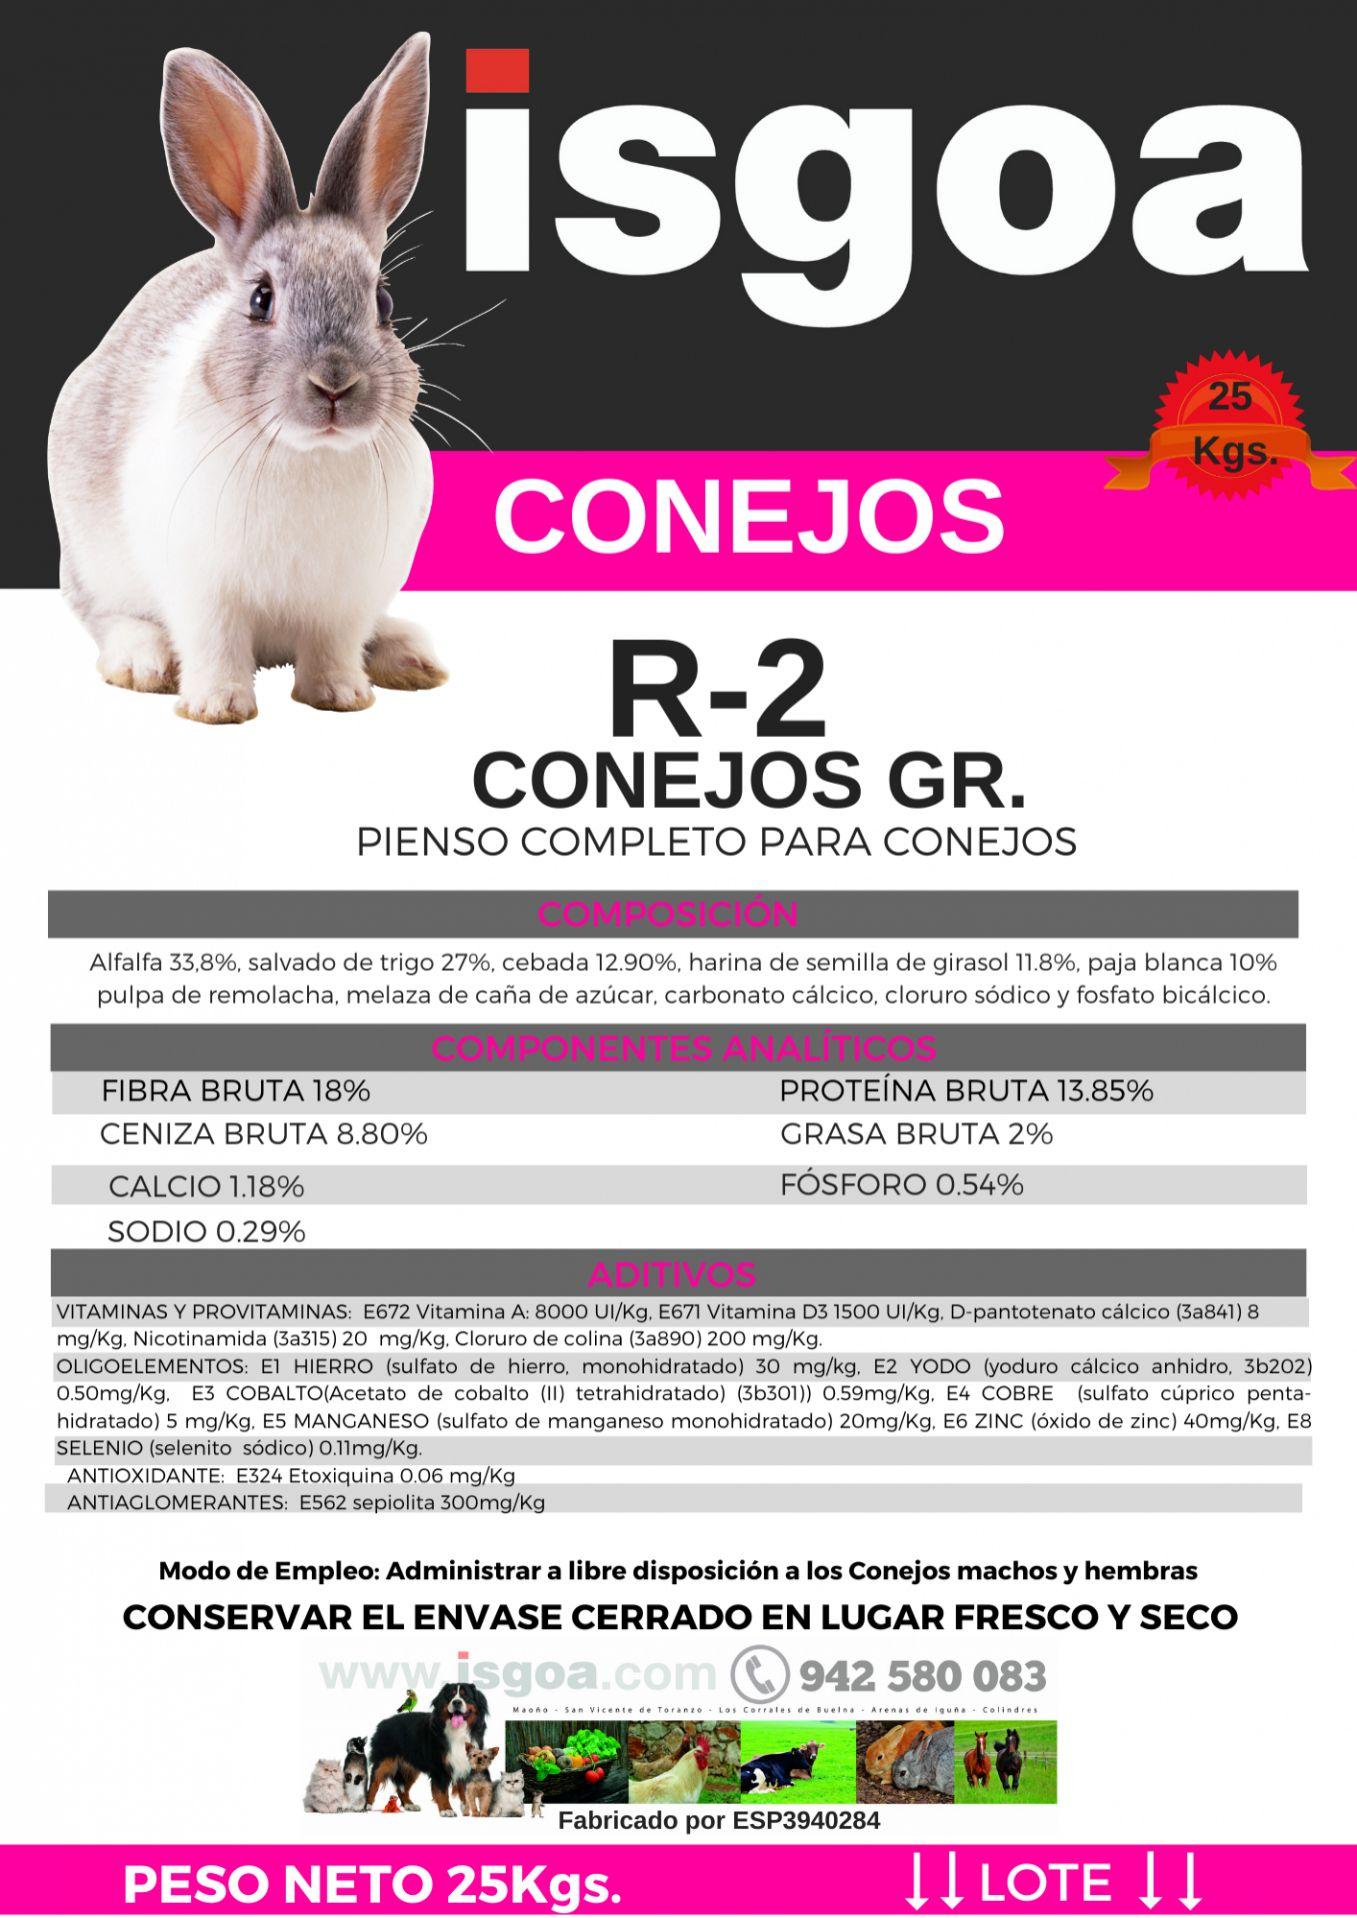 Pienso CONEJOS R-2 Isgoa